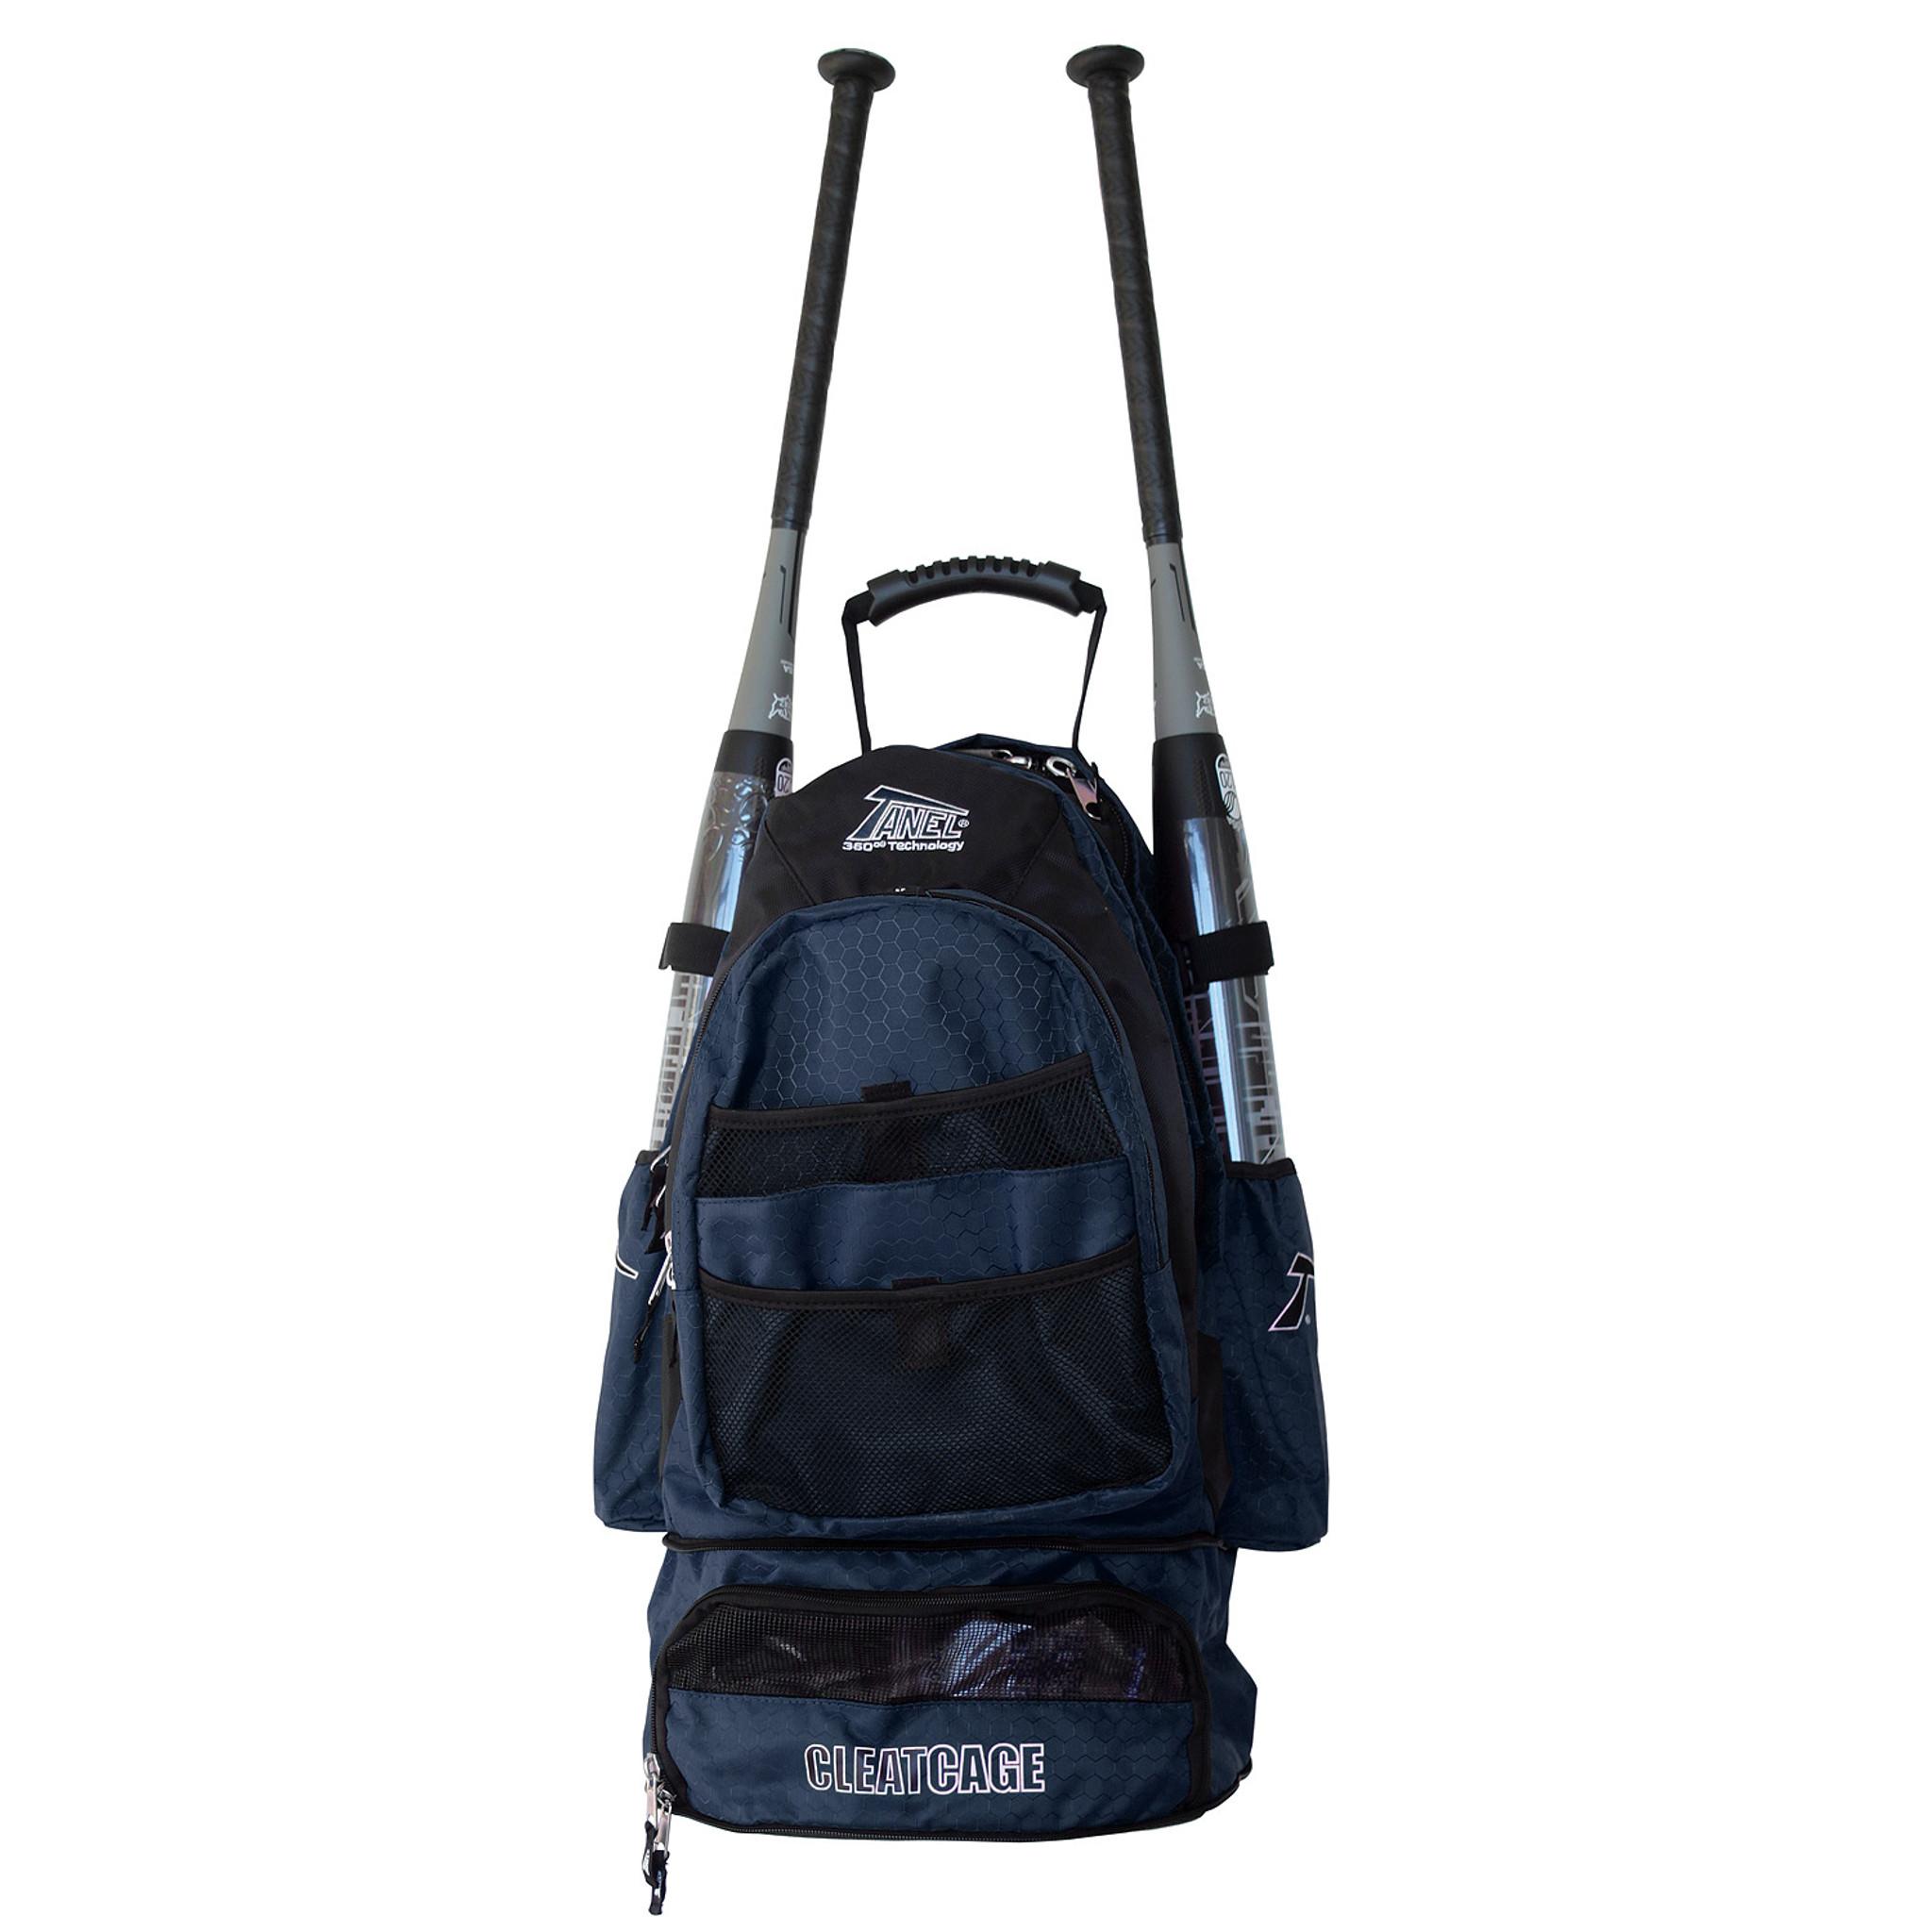 8a59550dd6a4 Tanel 360 BatPack Baseball/Softball Backpack Bag - BPAthletics.com